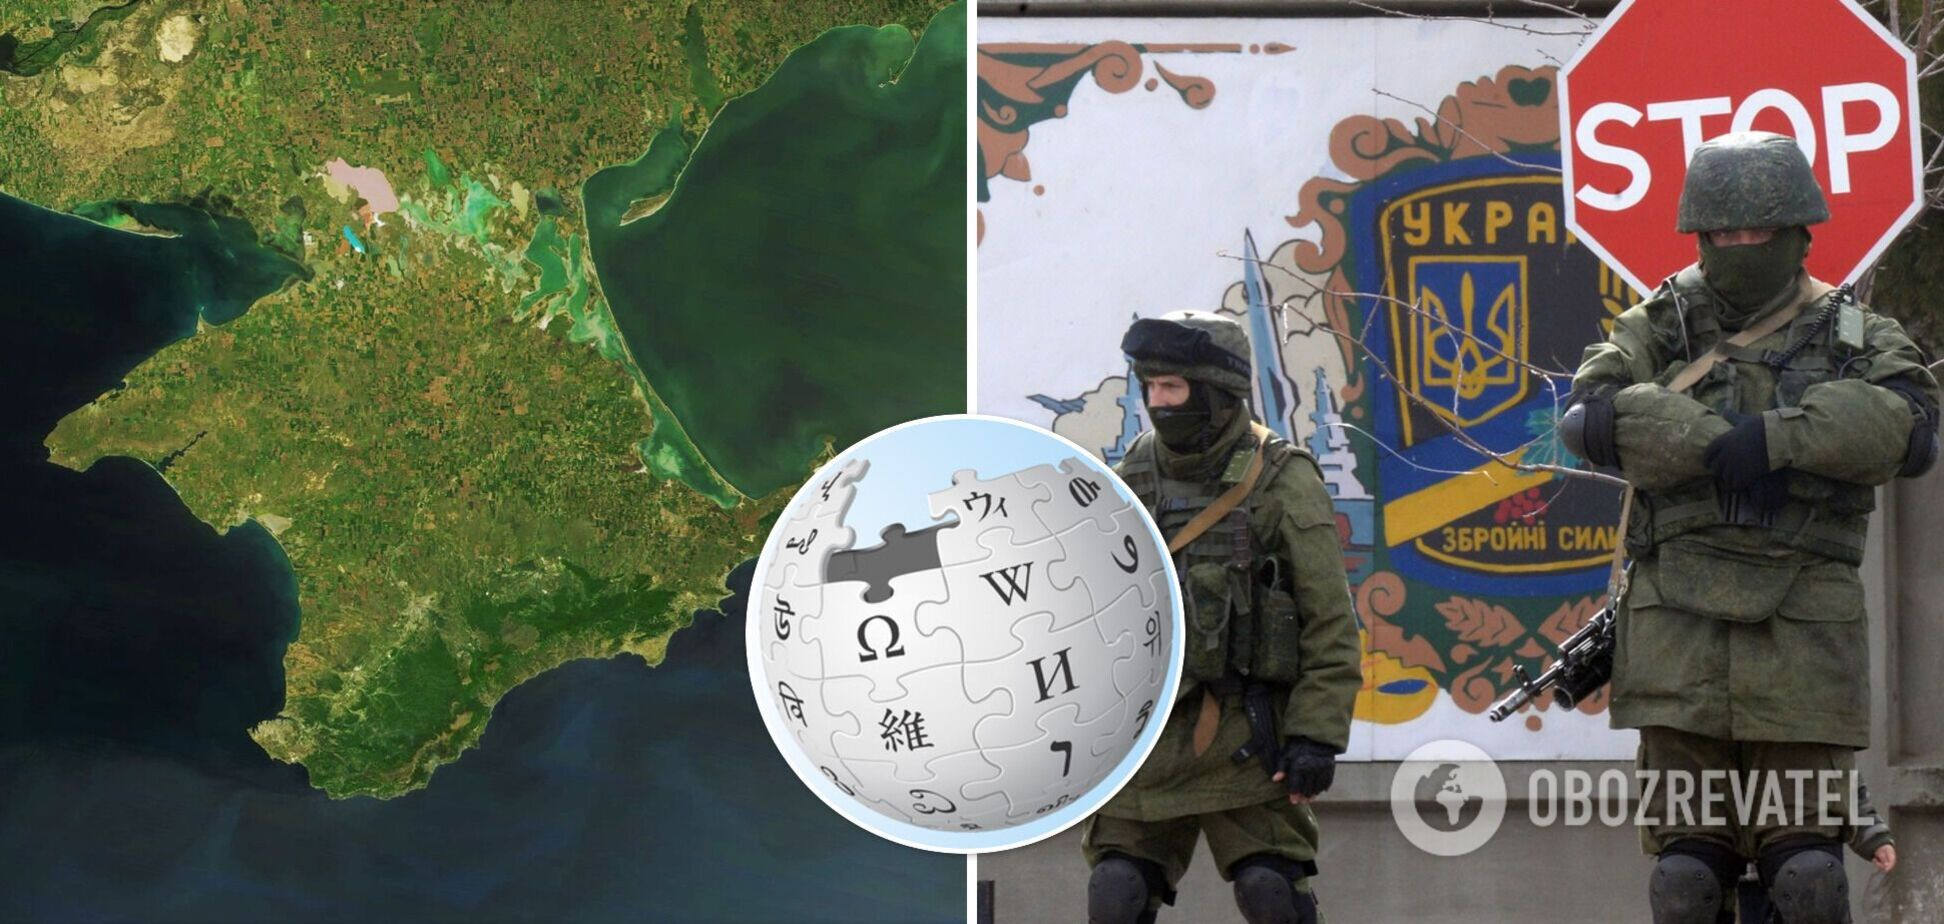 Википедия скандал из-за Крыма